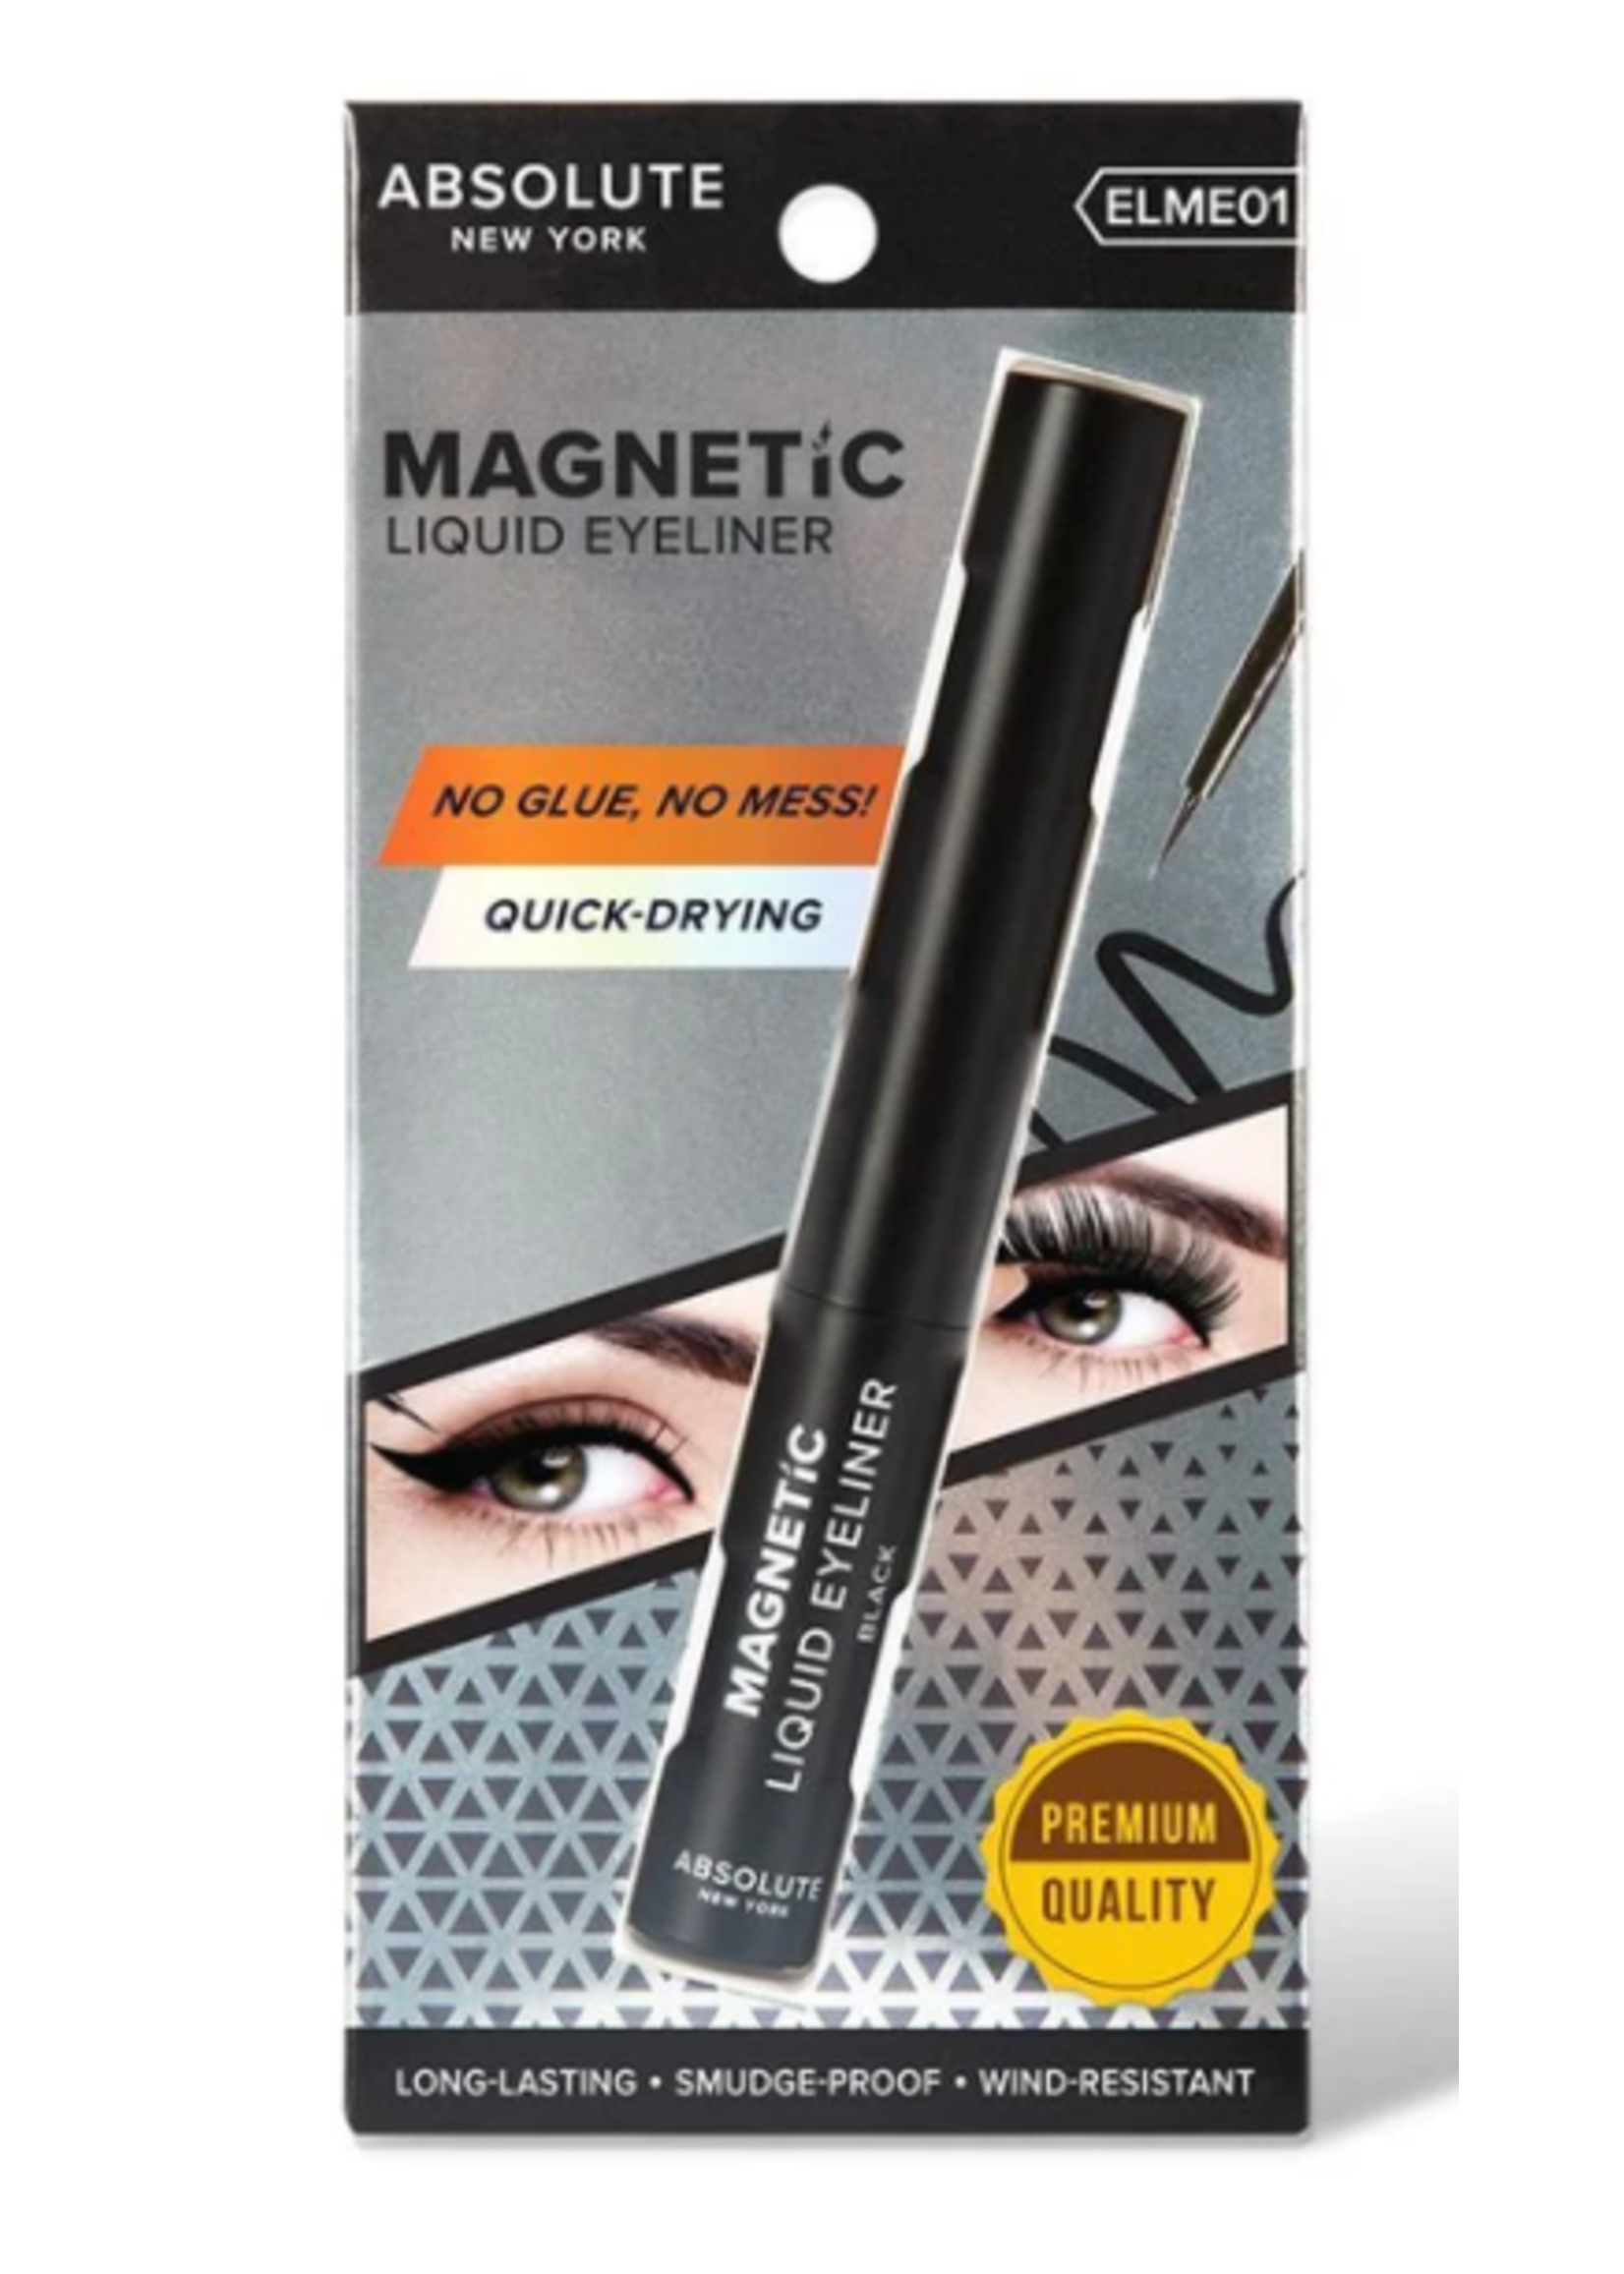 Absolute New York Magnetic Liquid Eyeliner